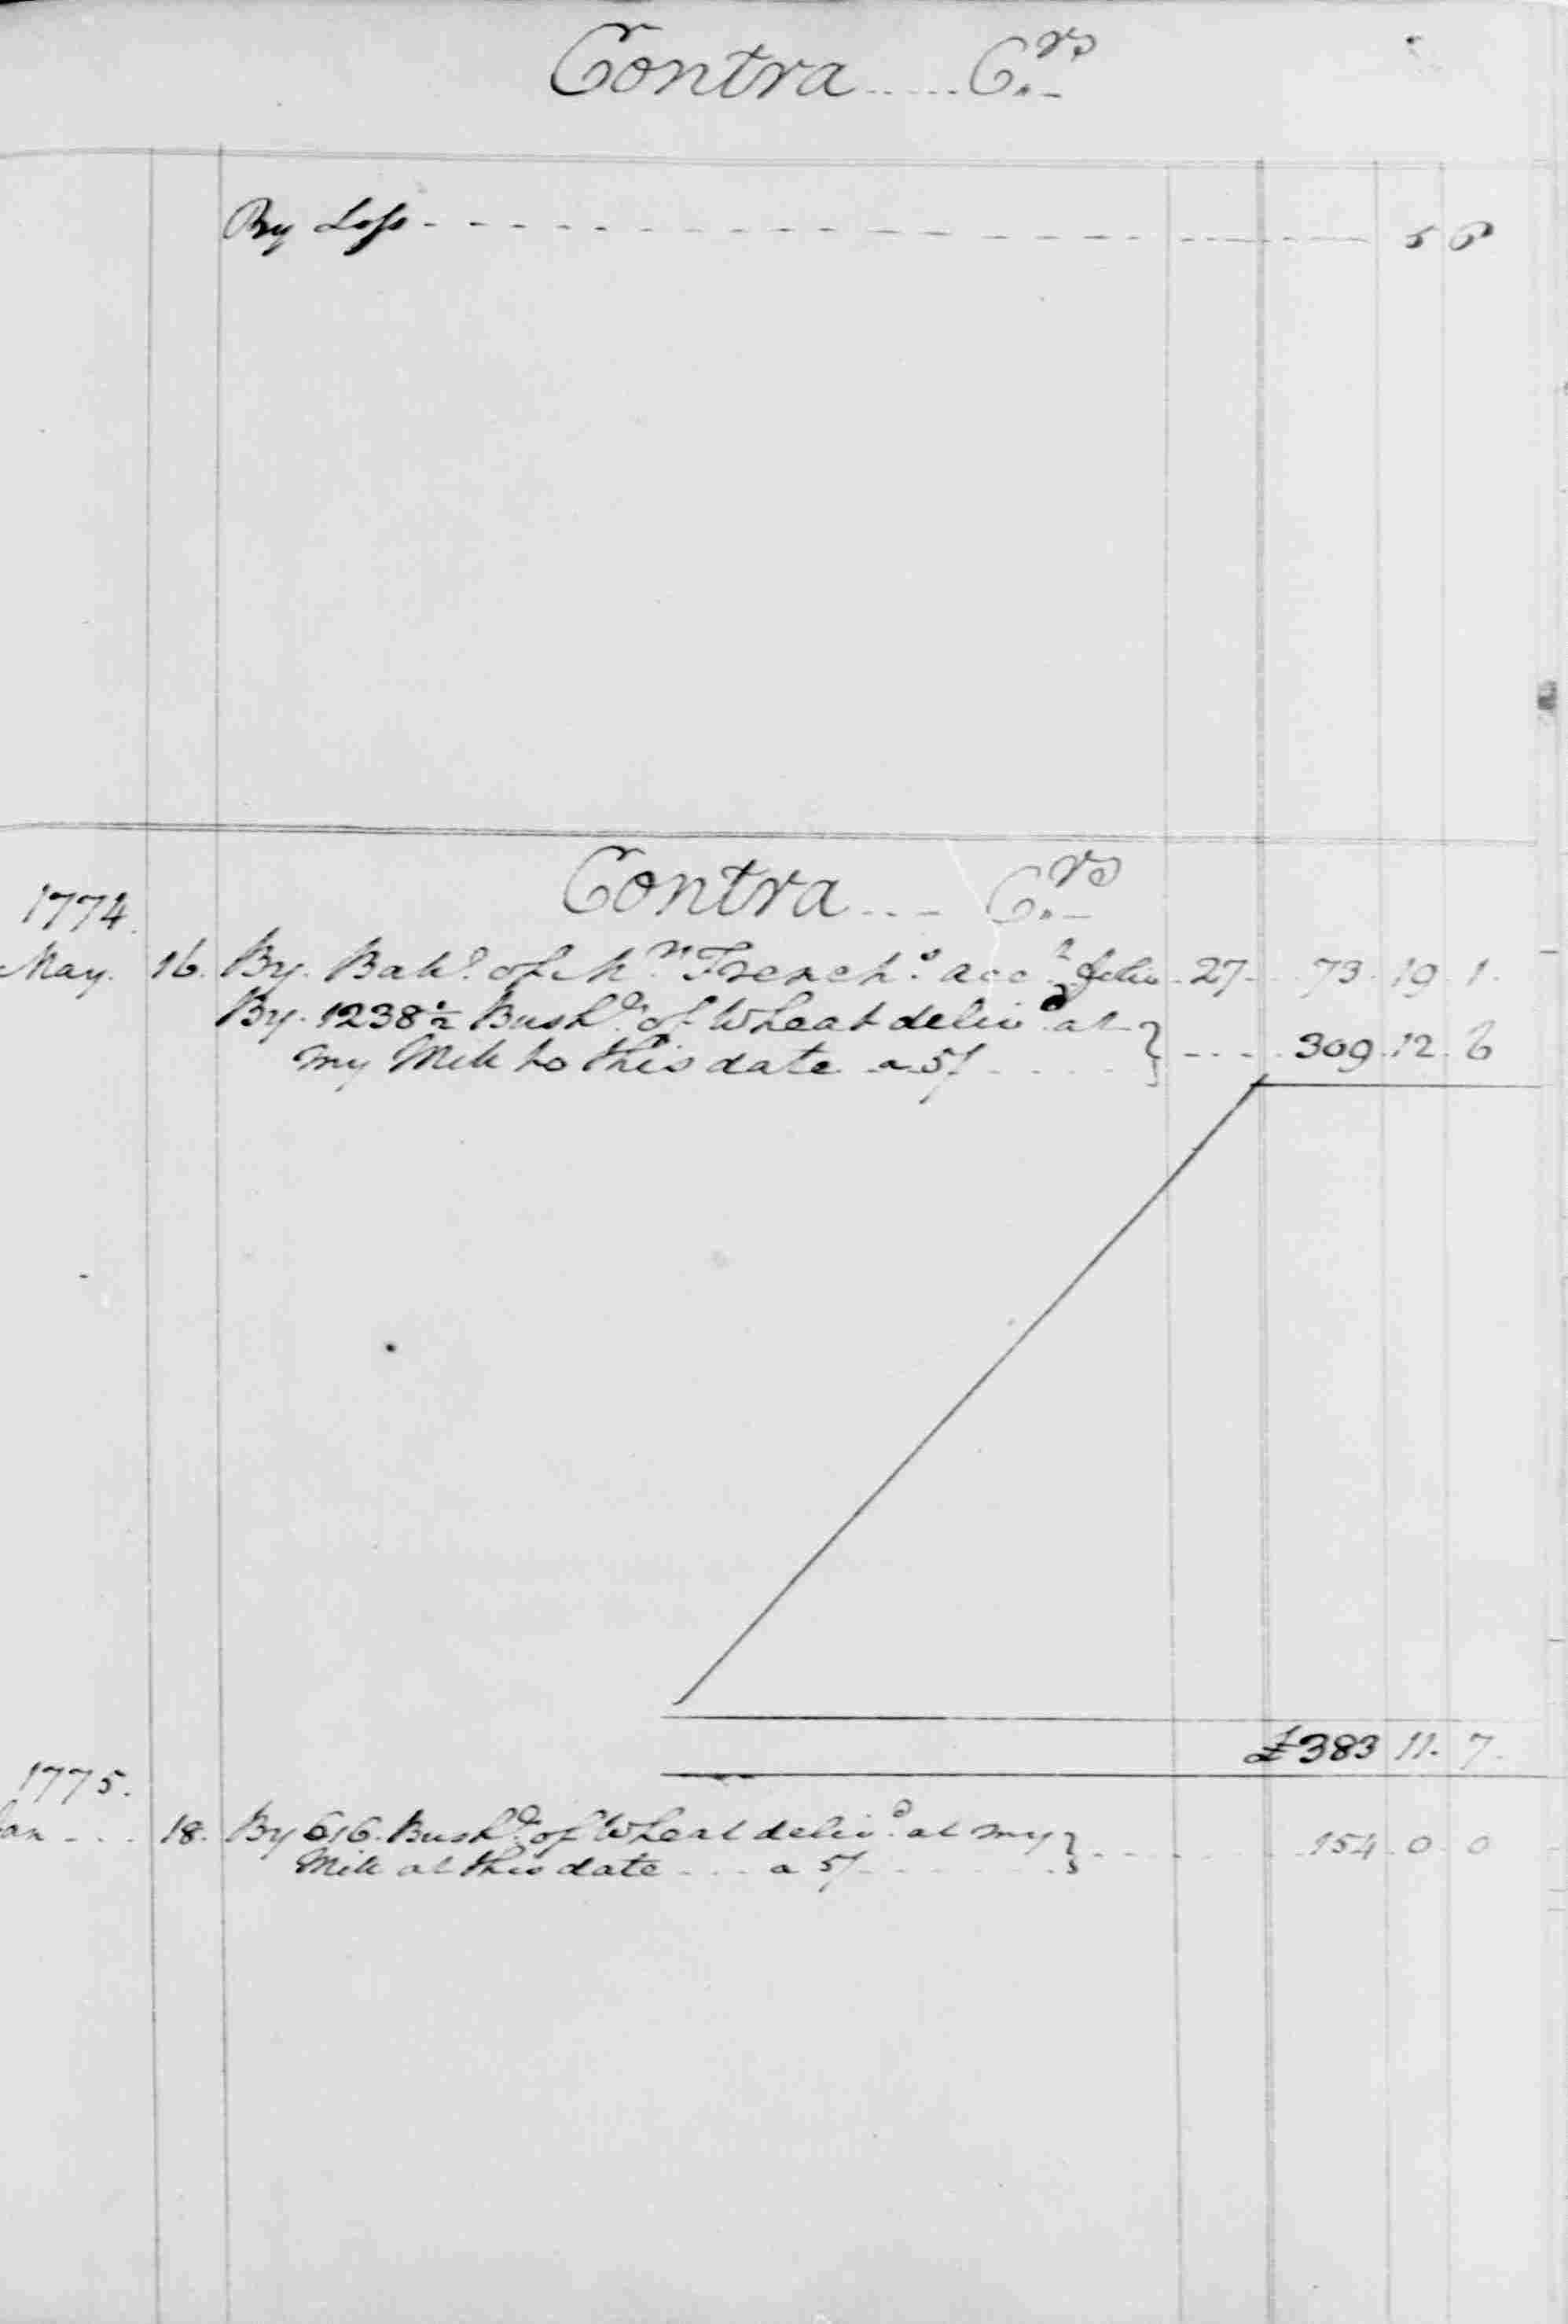 Ledger B, folio 78, right side